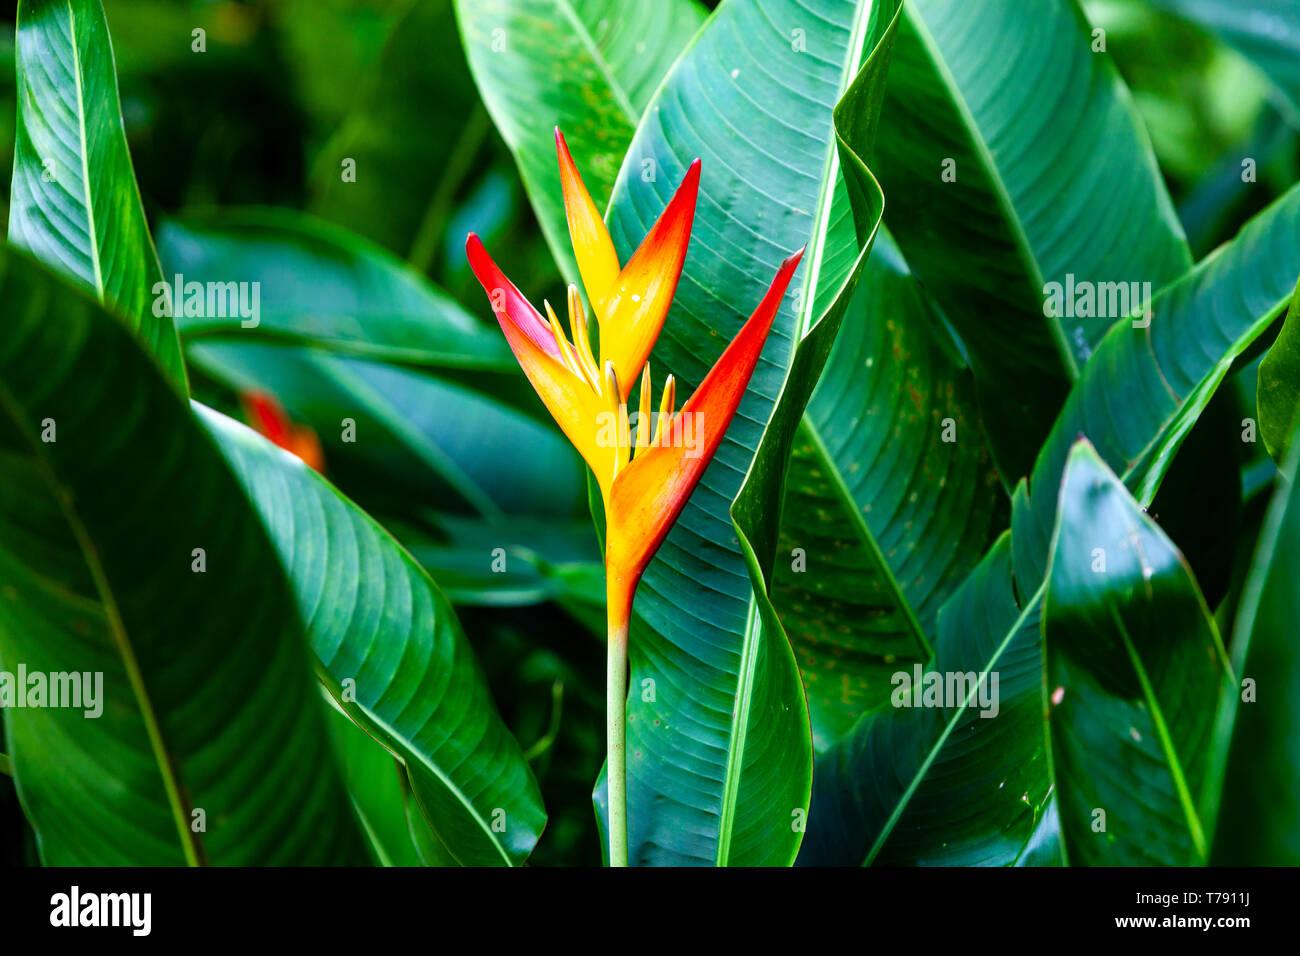 El Jardín Nacional de Orquídeas, los jardines botánicos de Singapur, Singapur, Sudeste de Asia Foto de stock